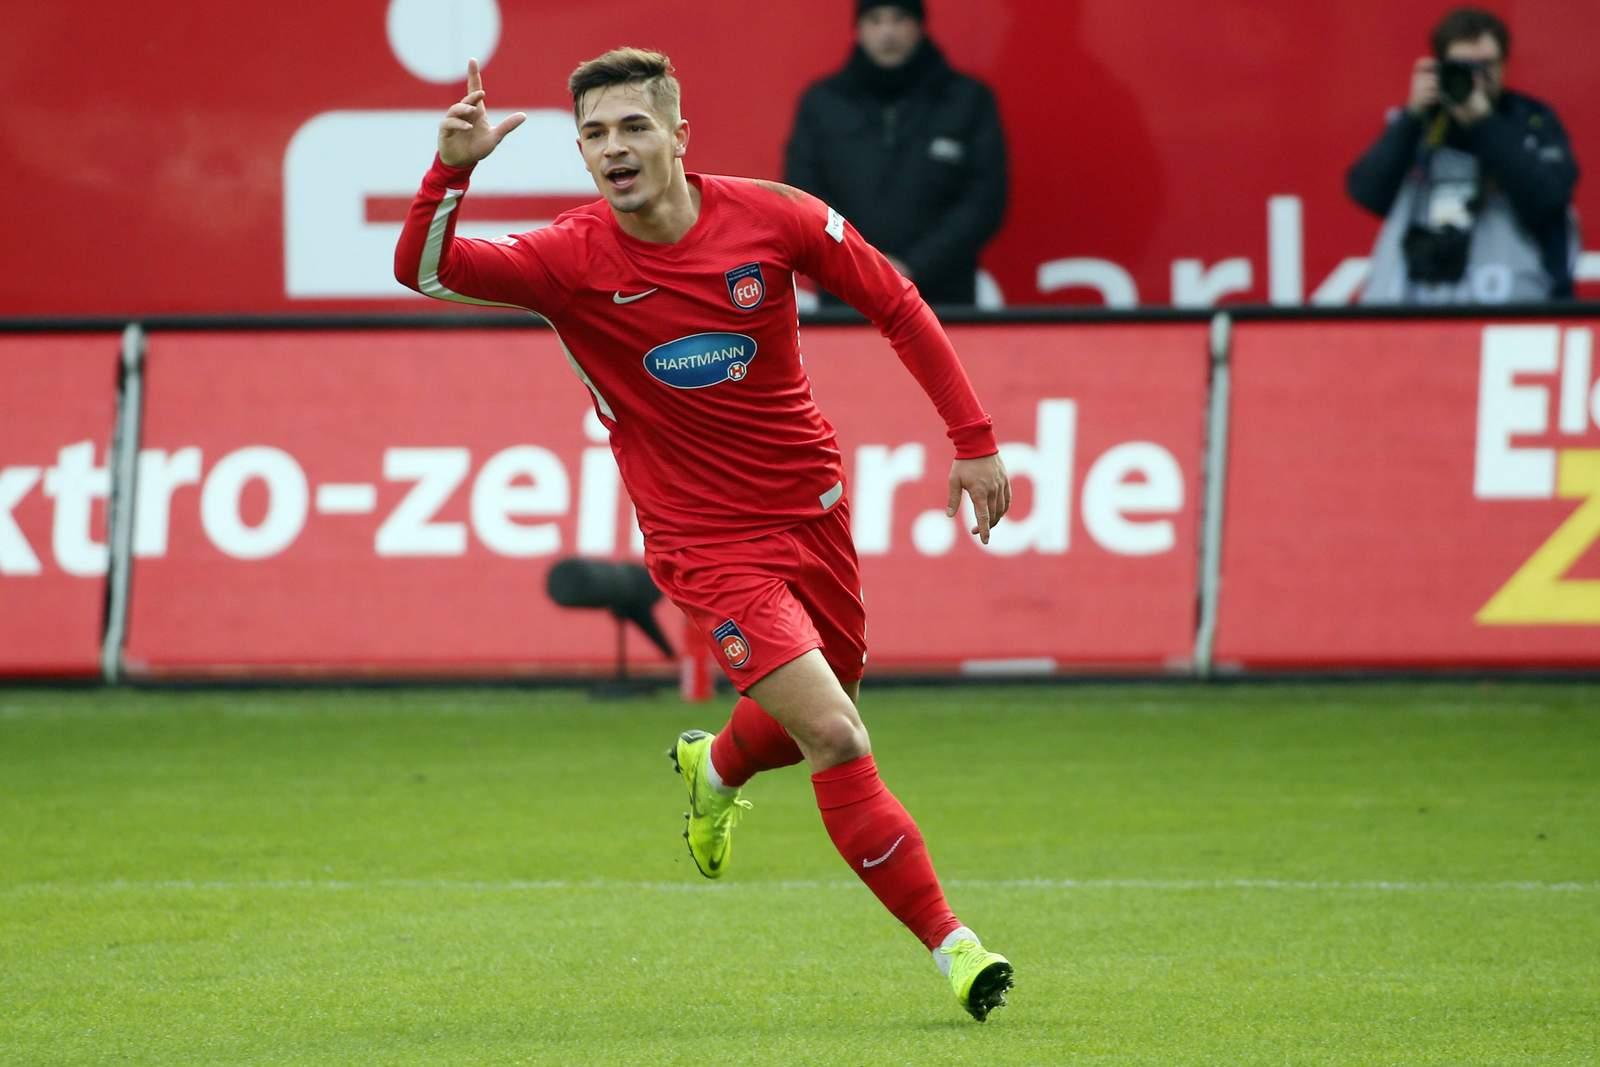 Nikola Dovedan vom 1.FC Heidenheim jubelt nach Tor